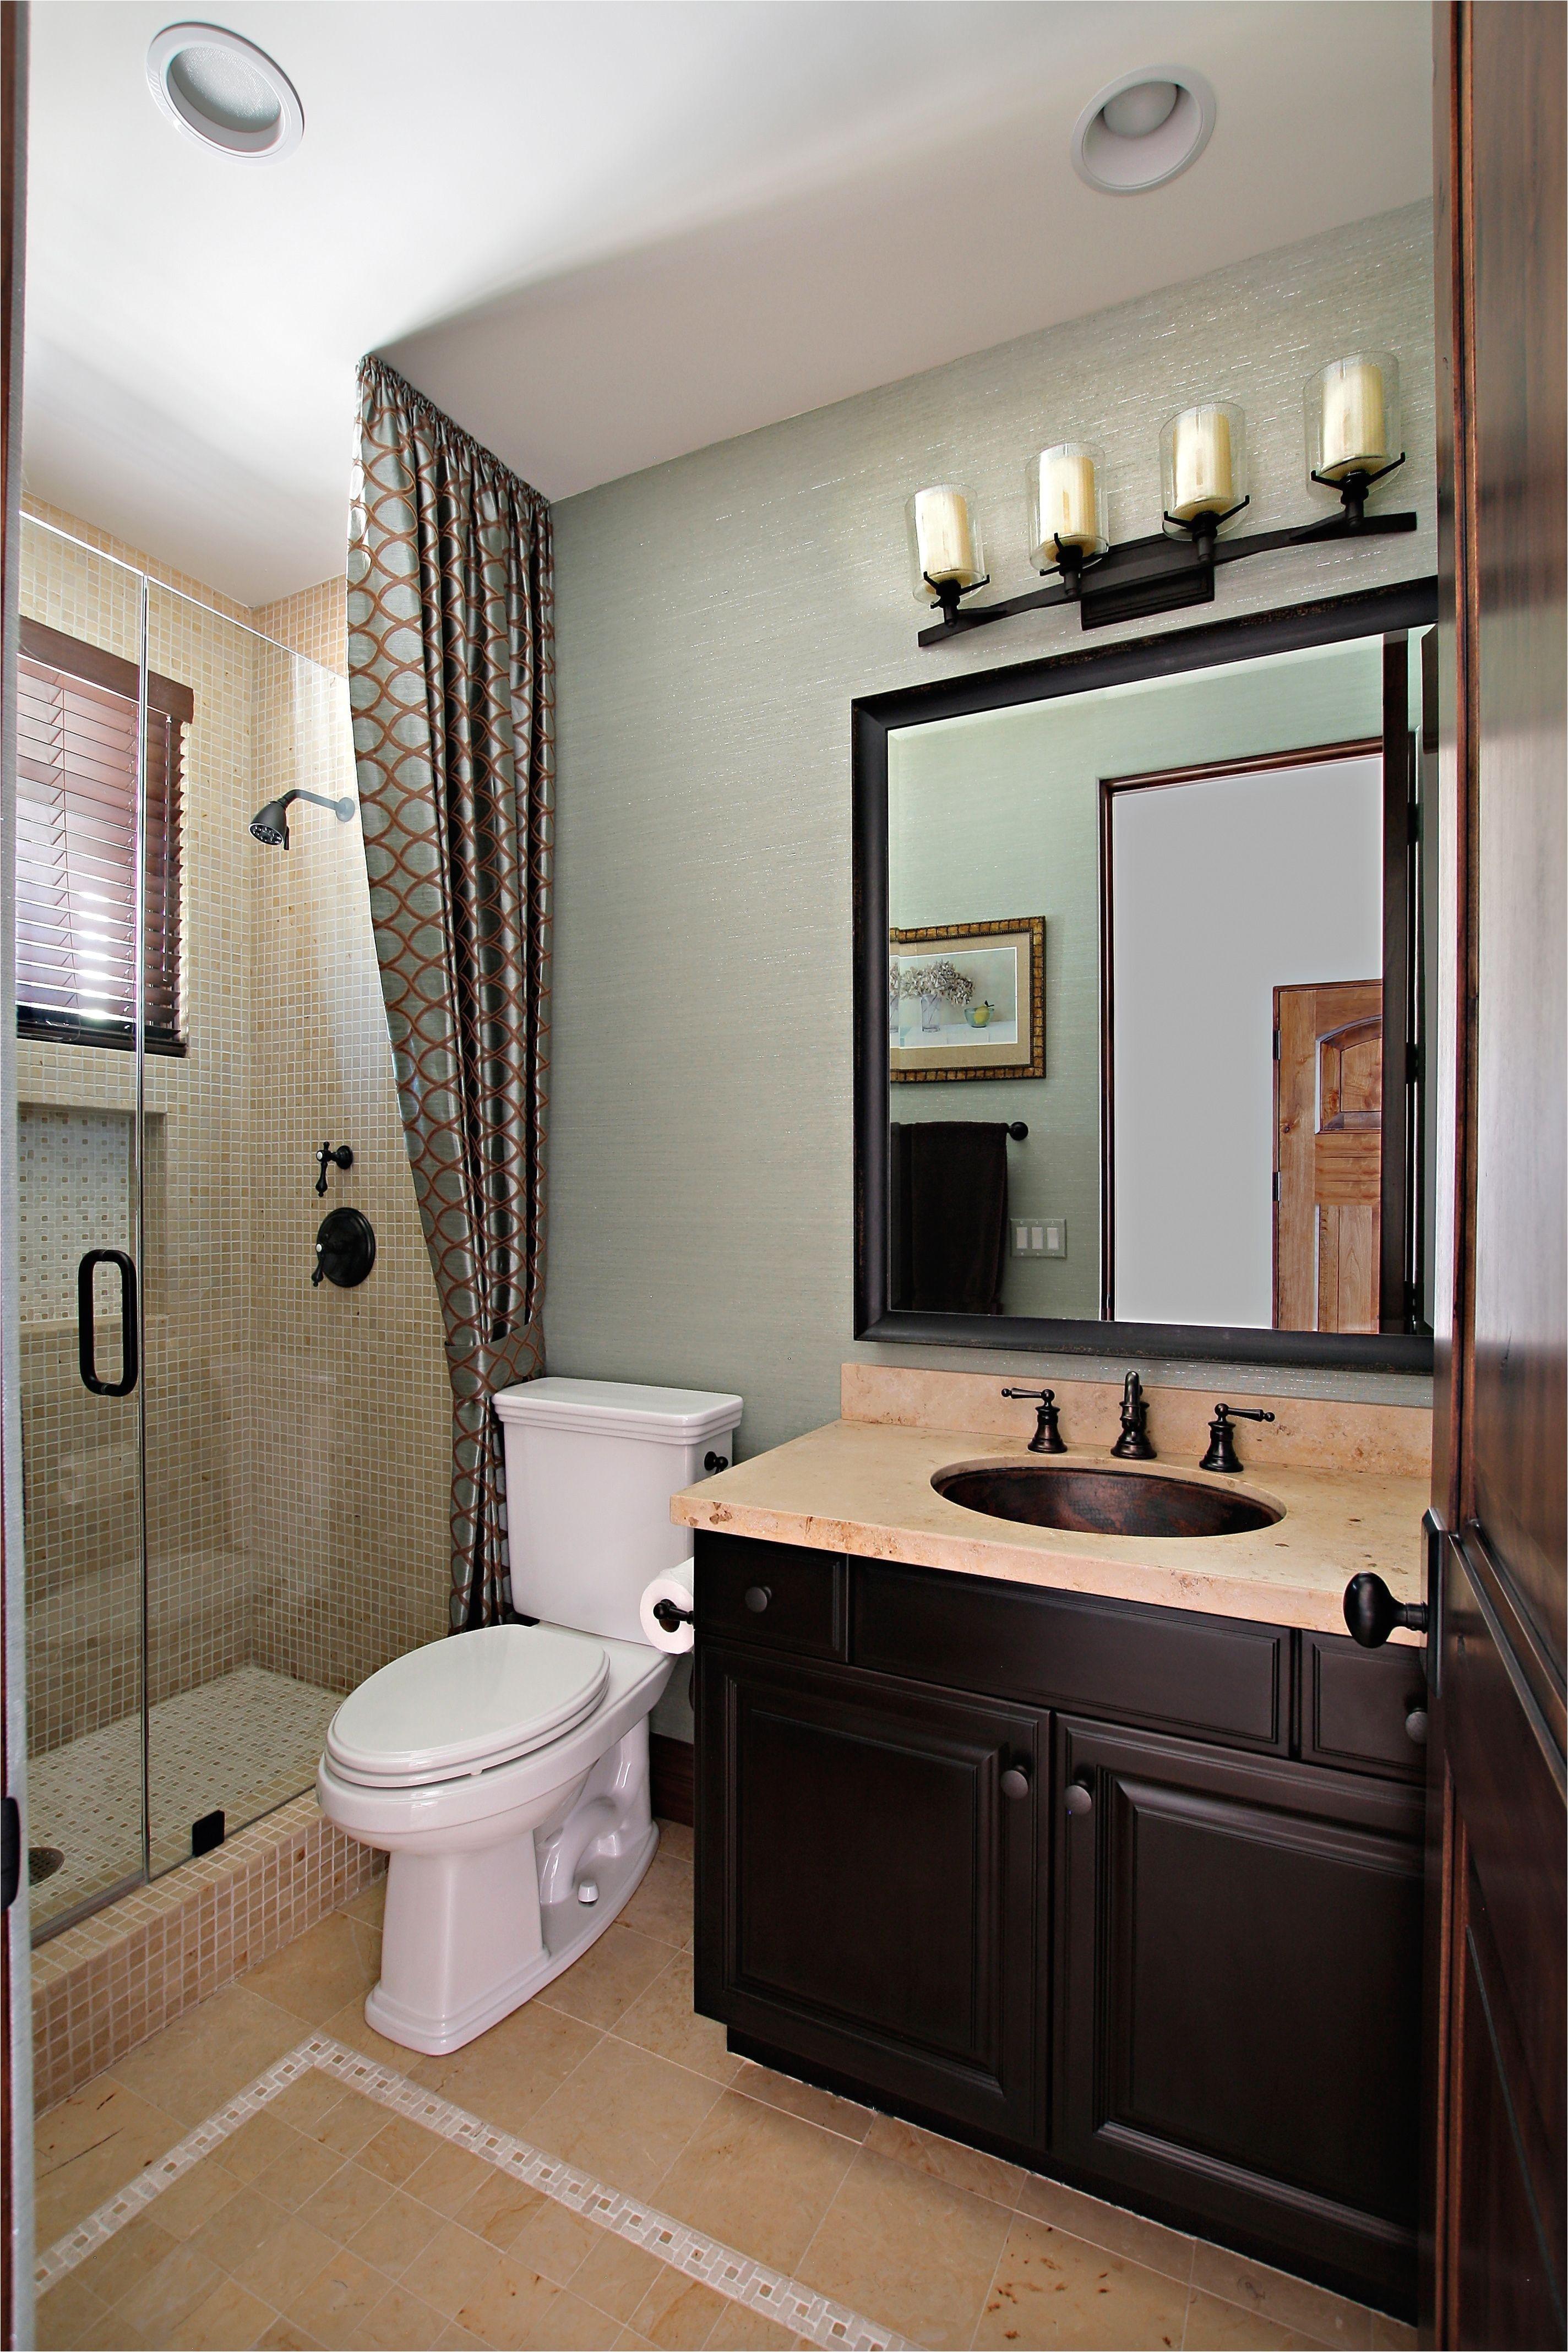 small bathroom remodel ideas save tub shower ideas for small bathrooms i pinimg originals 8e 04